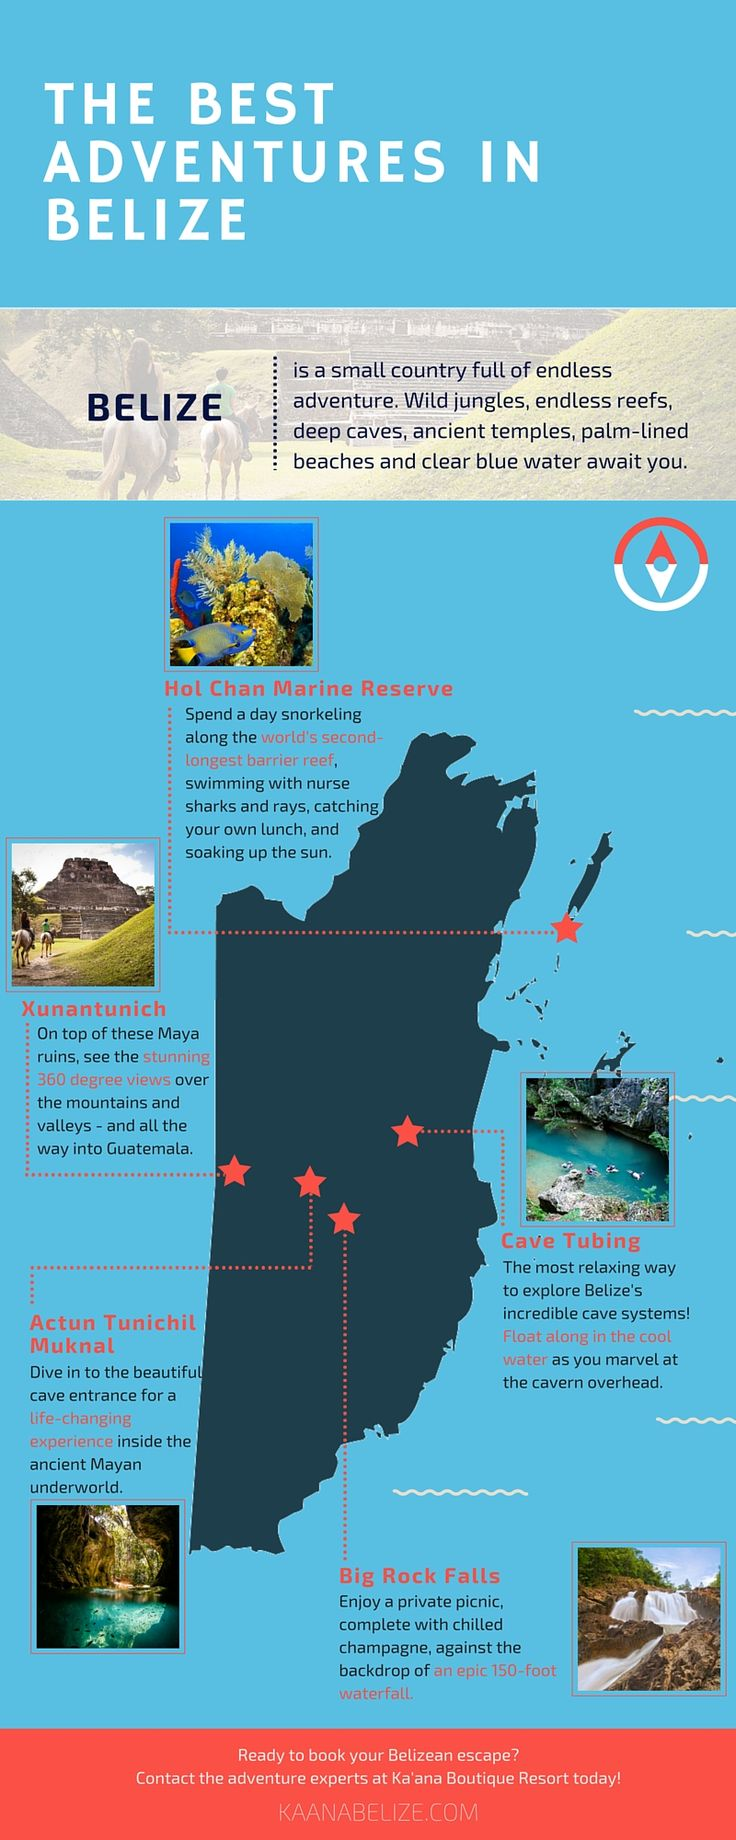 Map of the Best Adventures in Belize